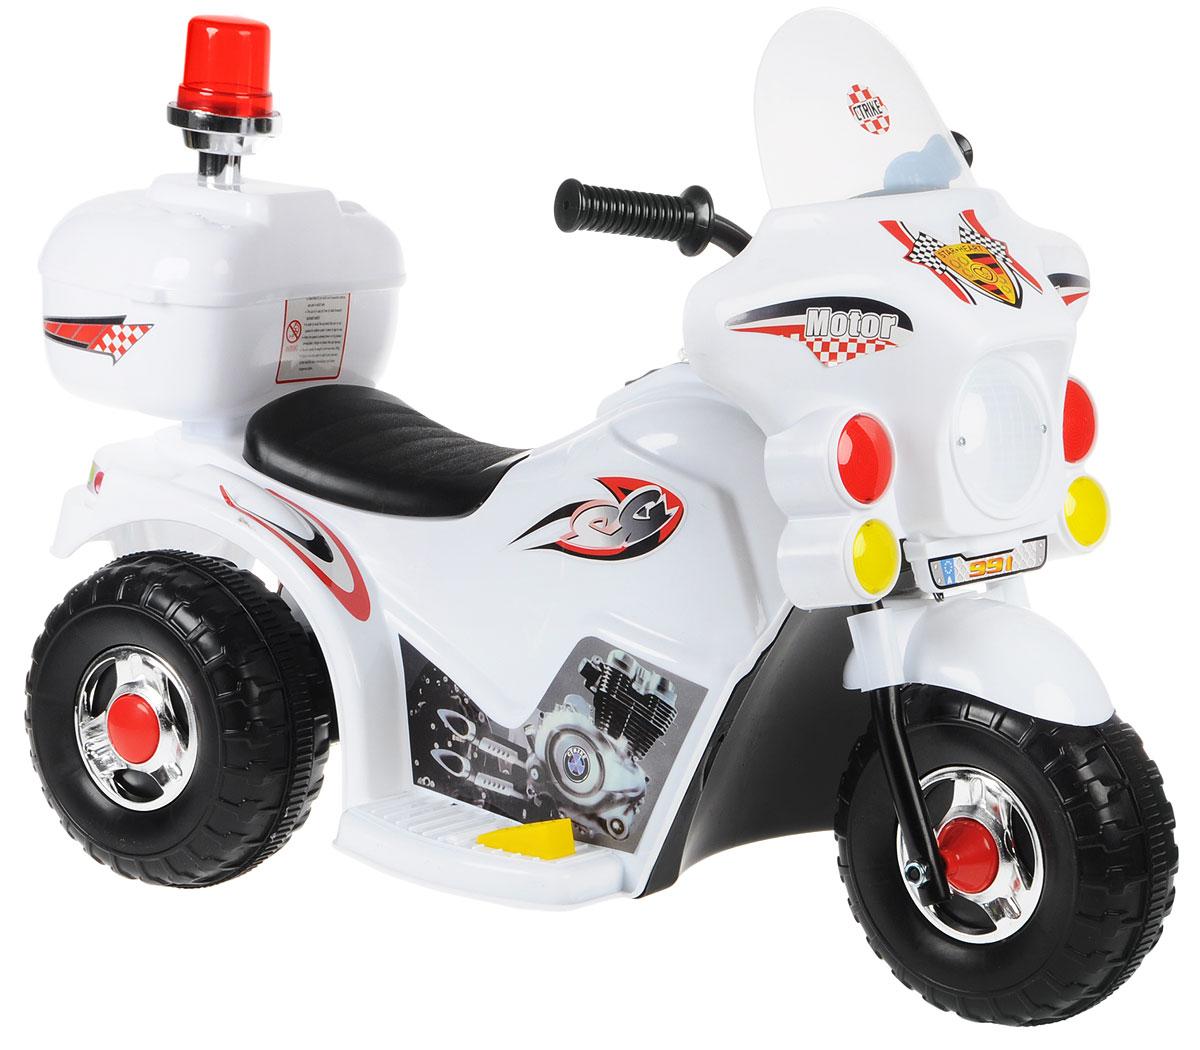 G120 Мотоцикл детский на аккумуляторе с маячком цвет белый